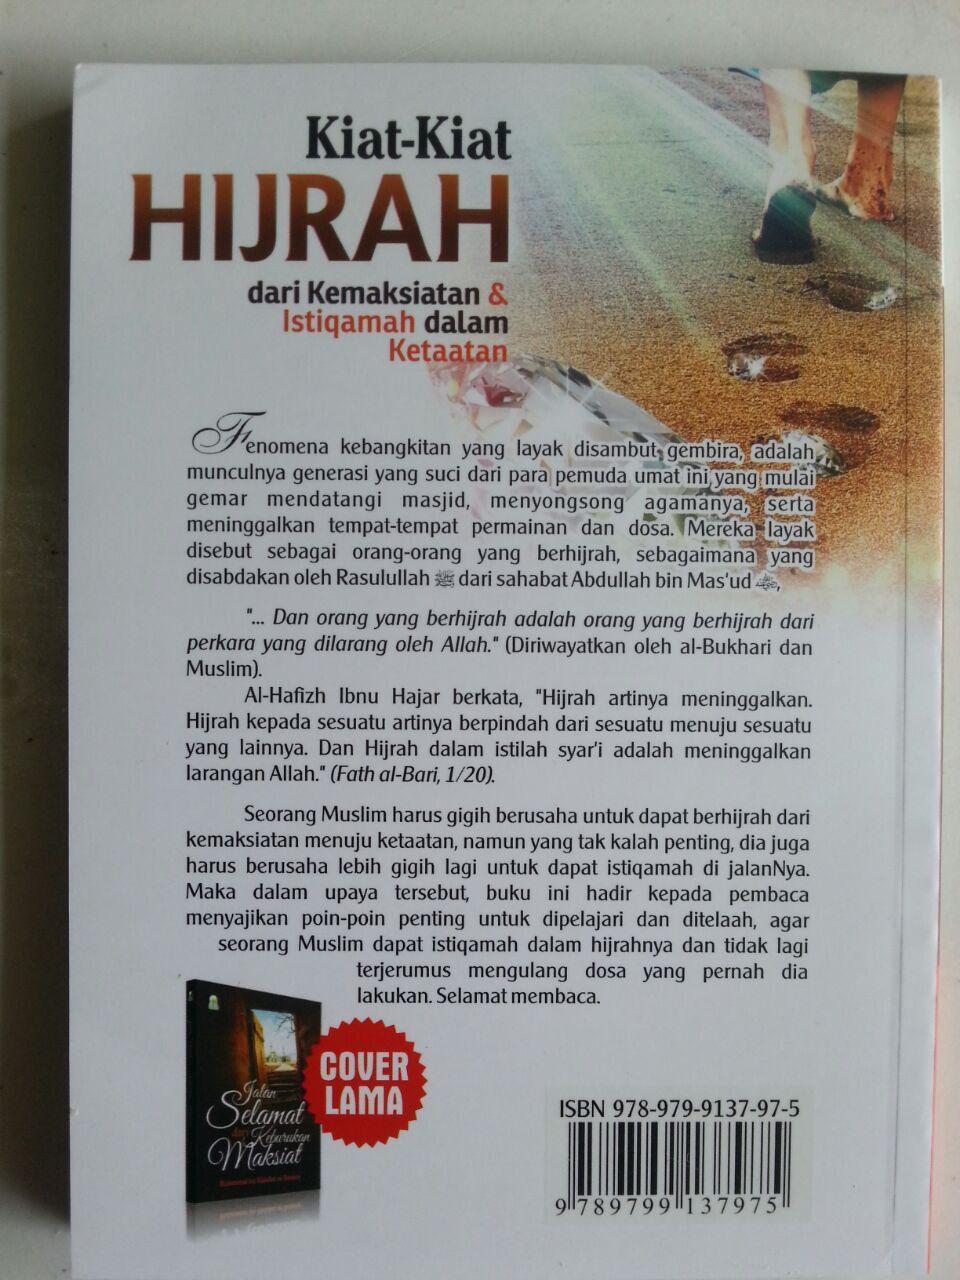 Buku Kiat-Kiat Hijrah Dari Kemaksiatan Kemudian Istiqomah Dalam Ketaatan cover